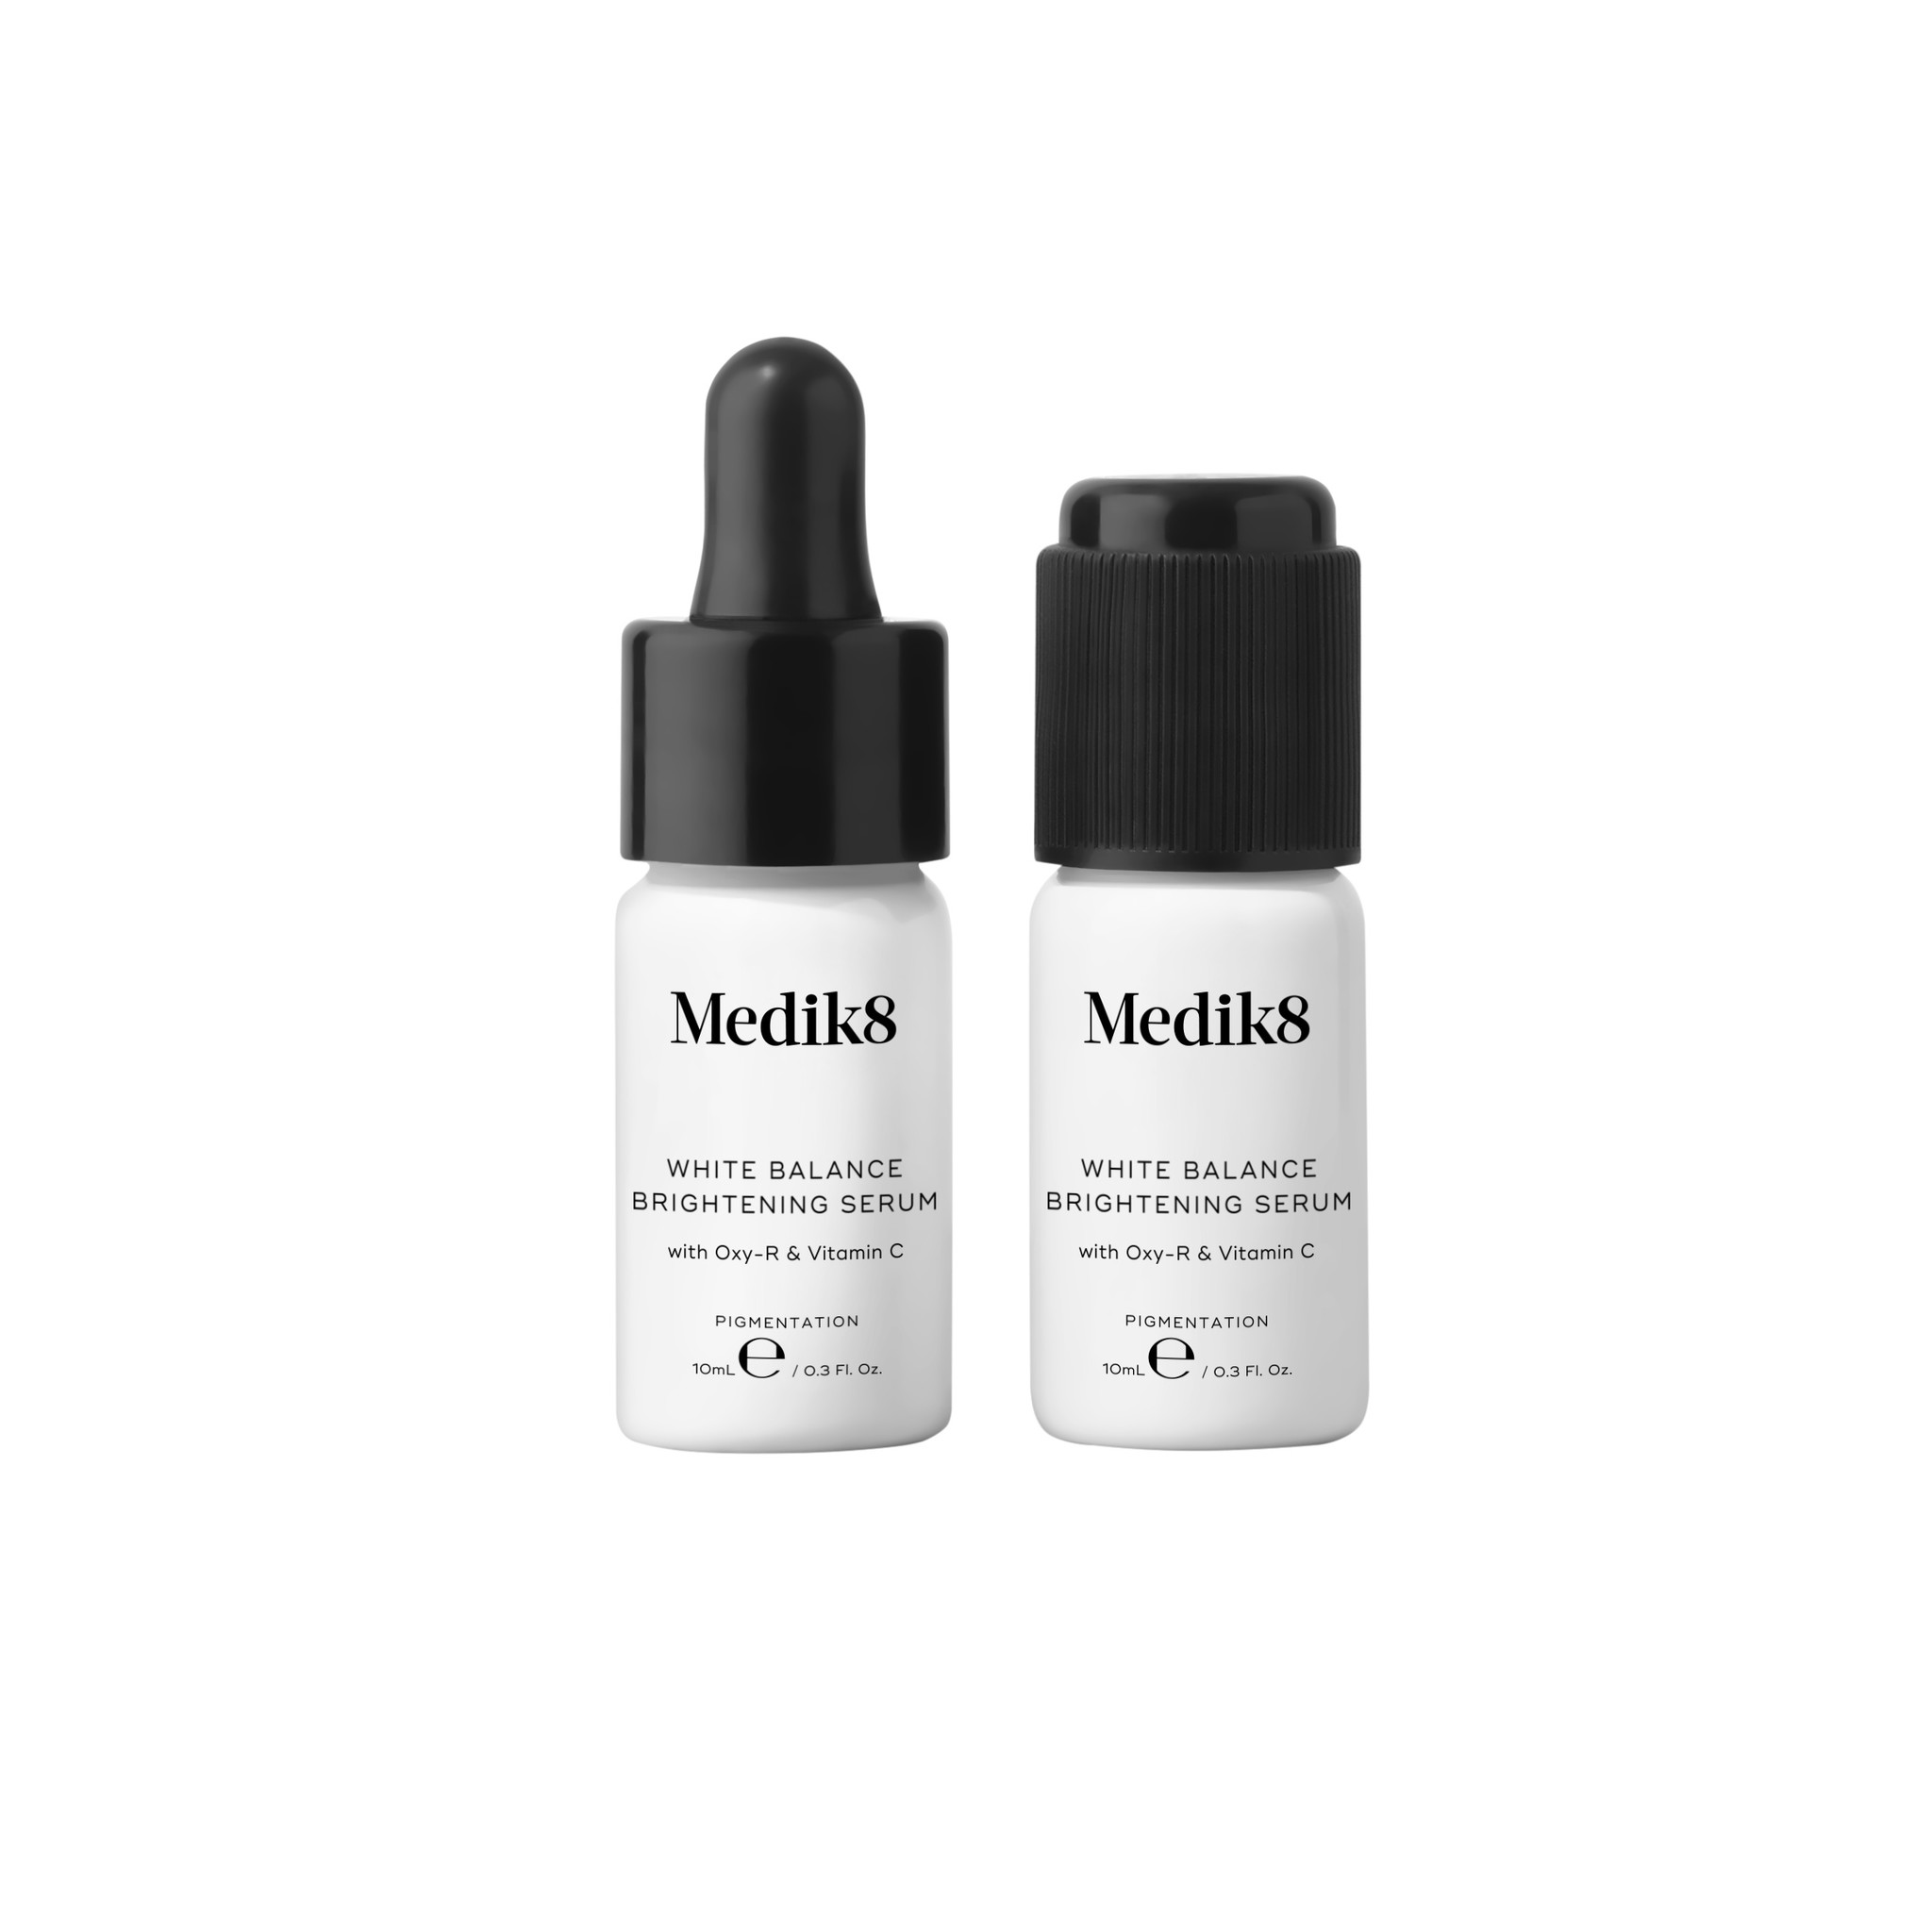 Medik8 Medik8 White Balance Brightening Serum 2 x 10ml (white balance click oxy-r)